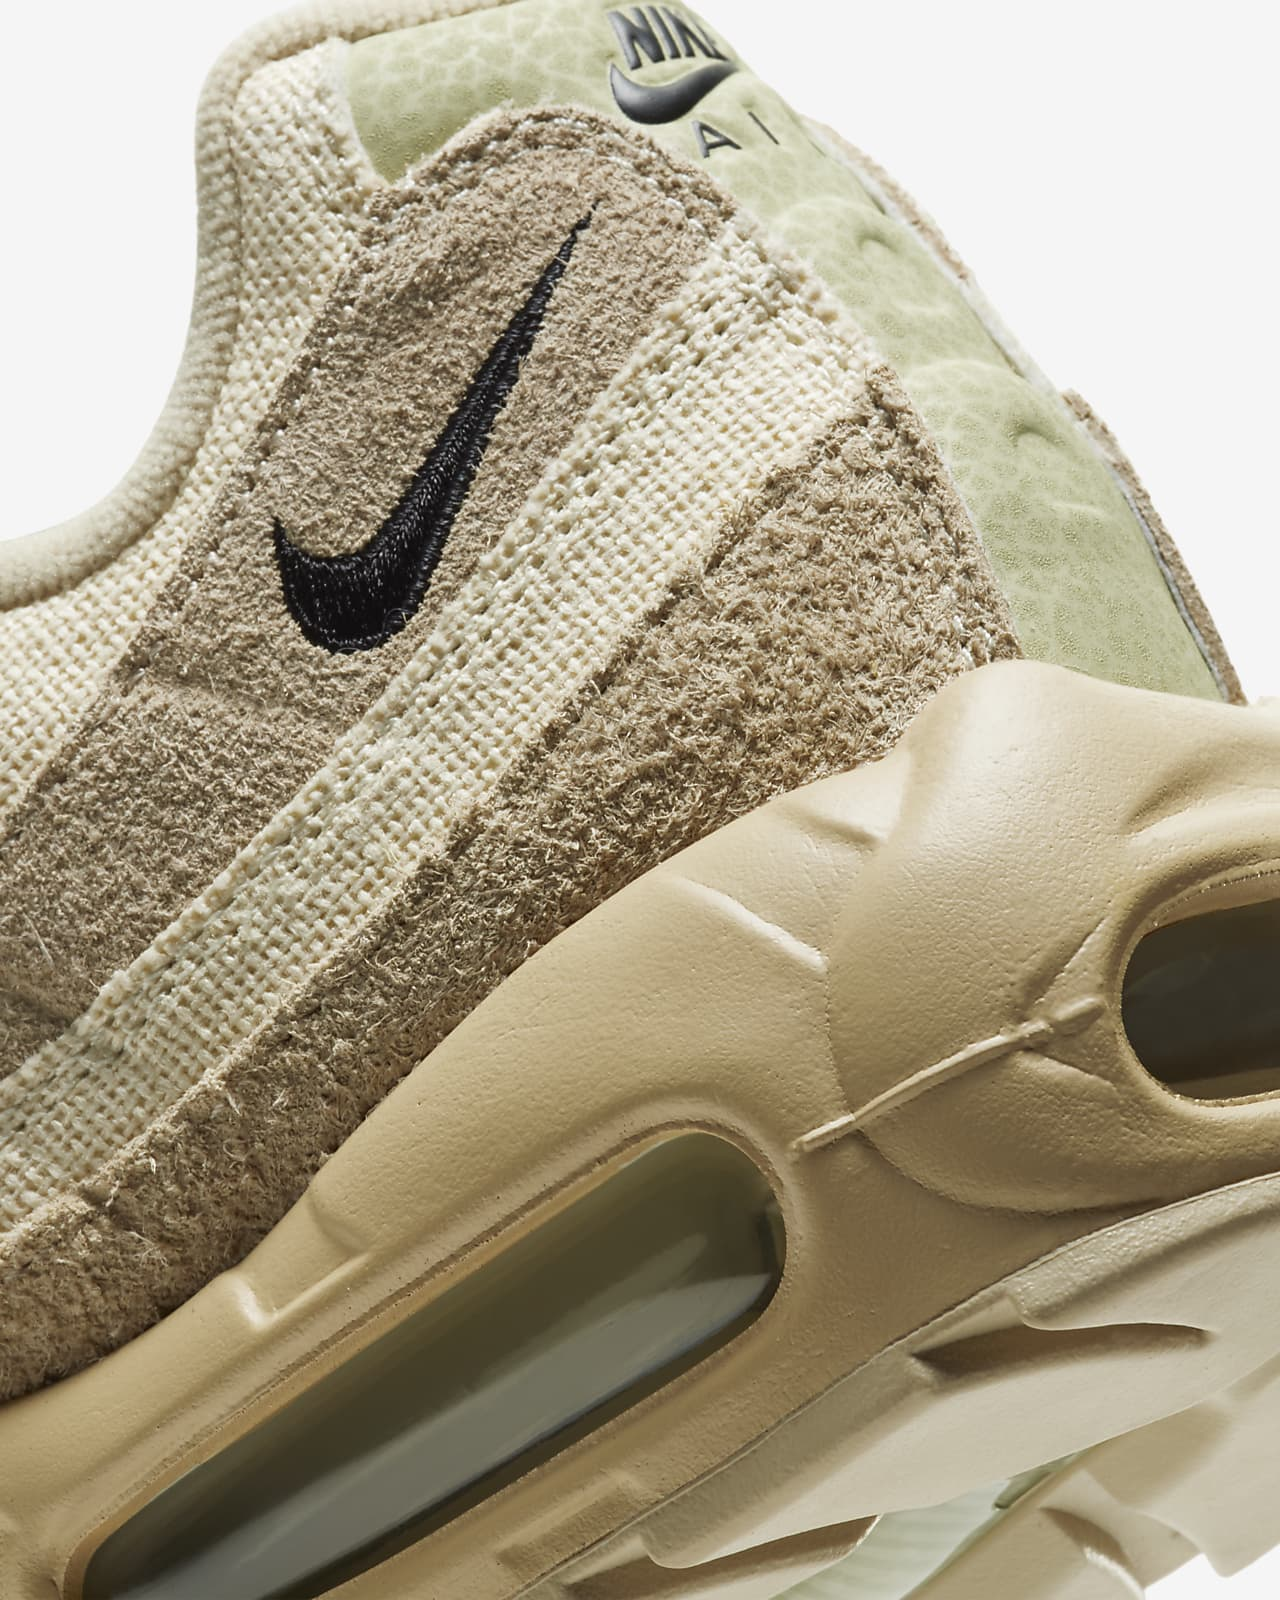 Scarpa Nike Air Max 95 Premium - Uomo